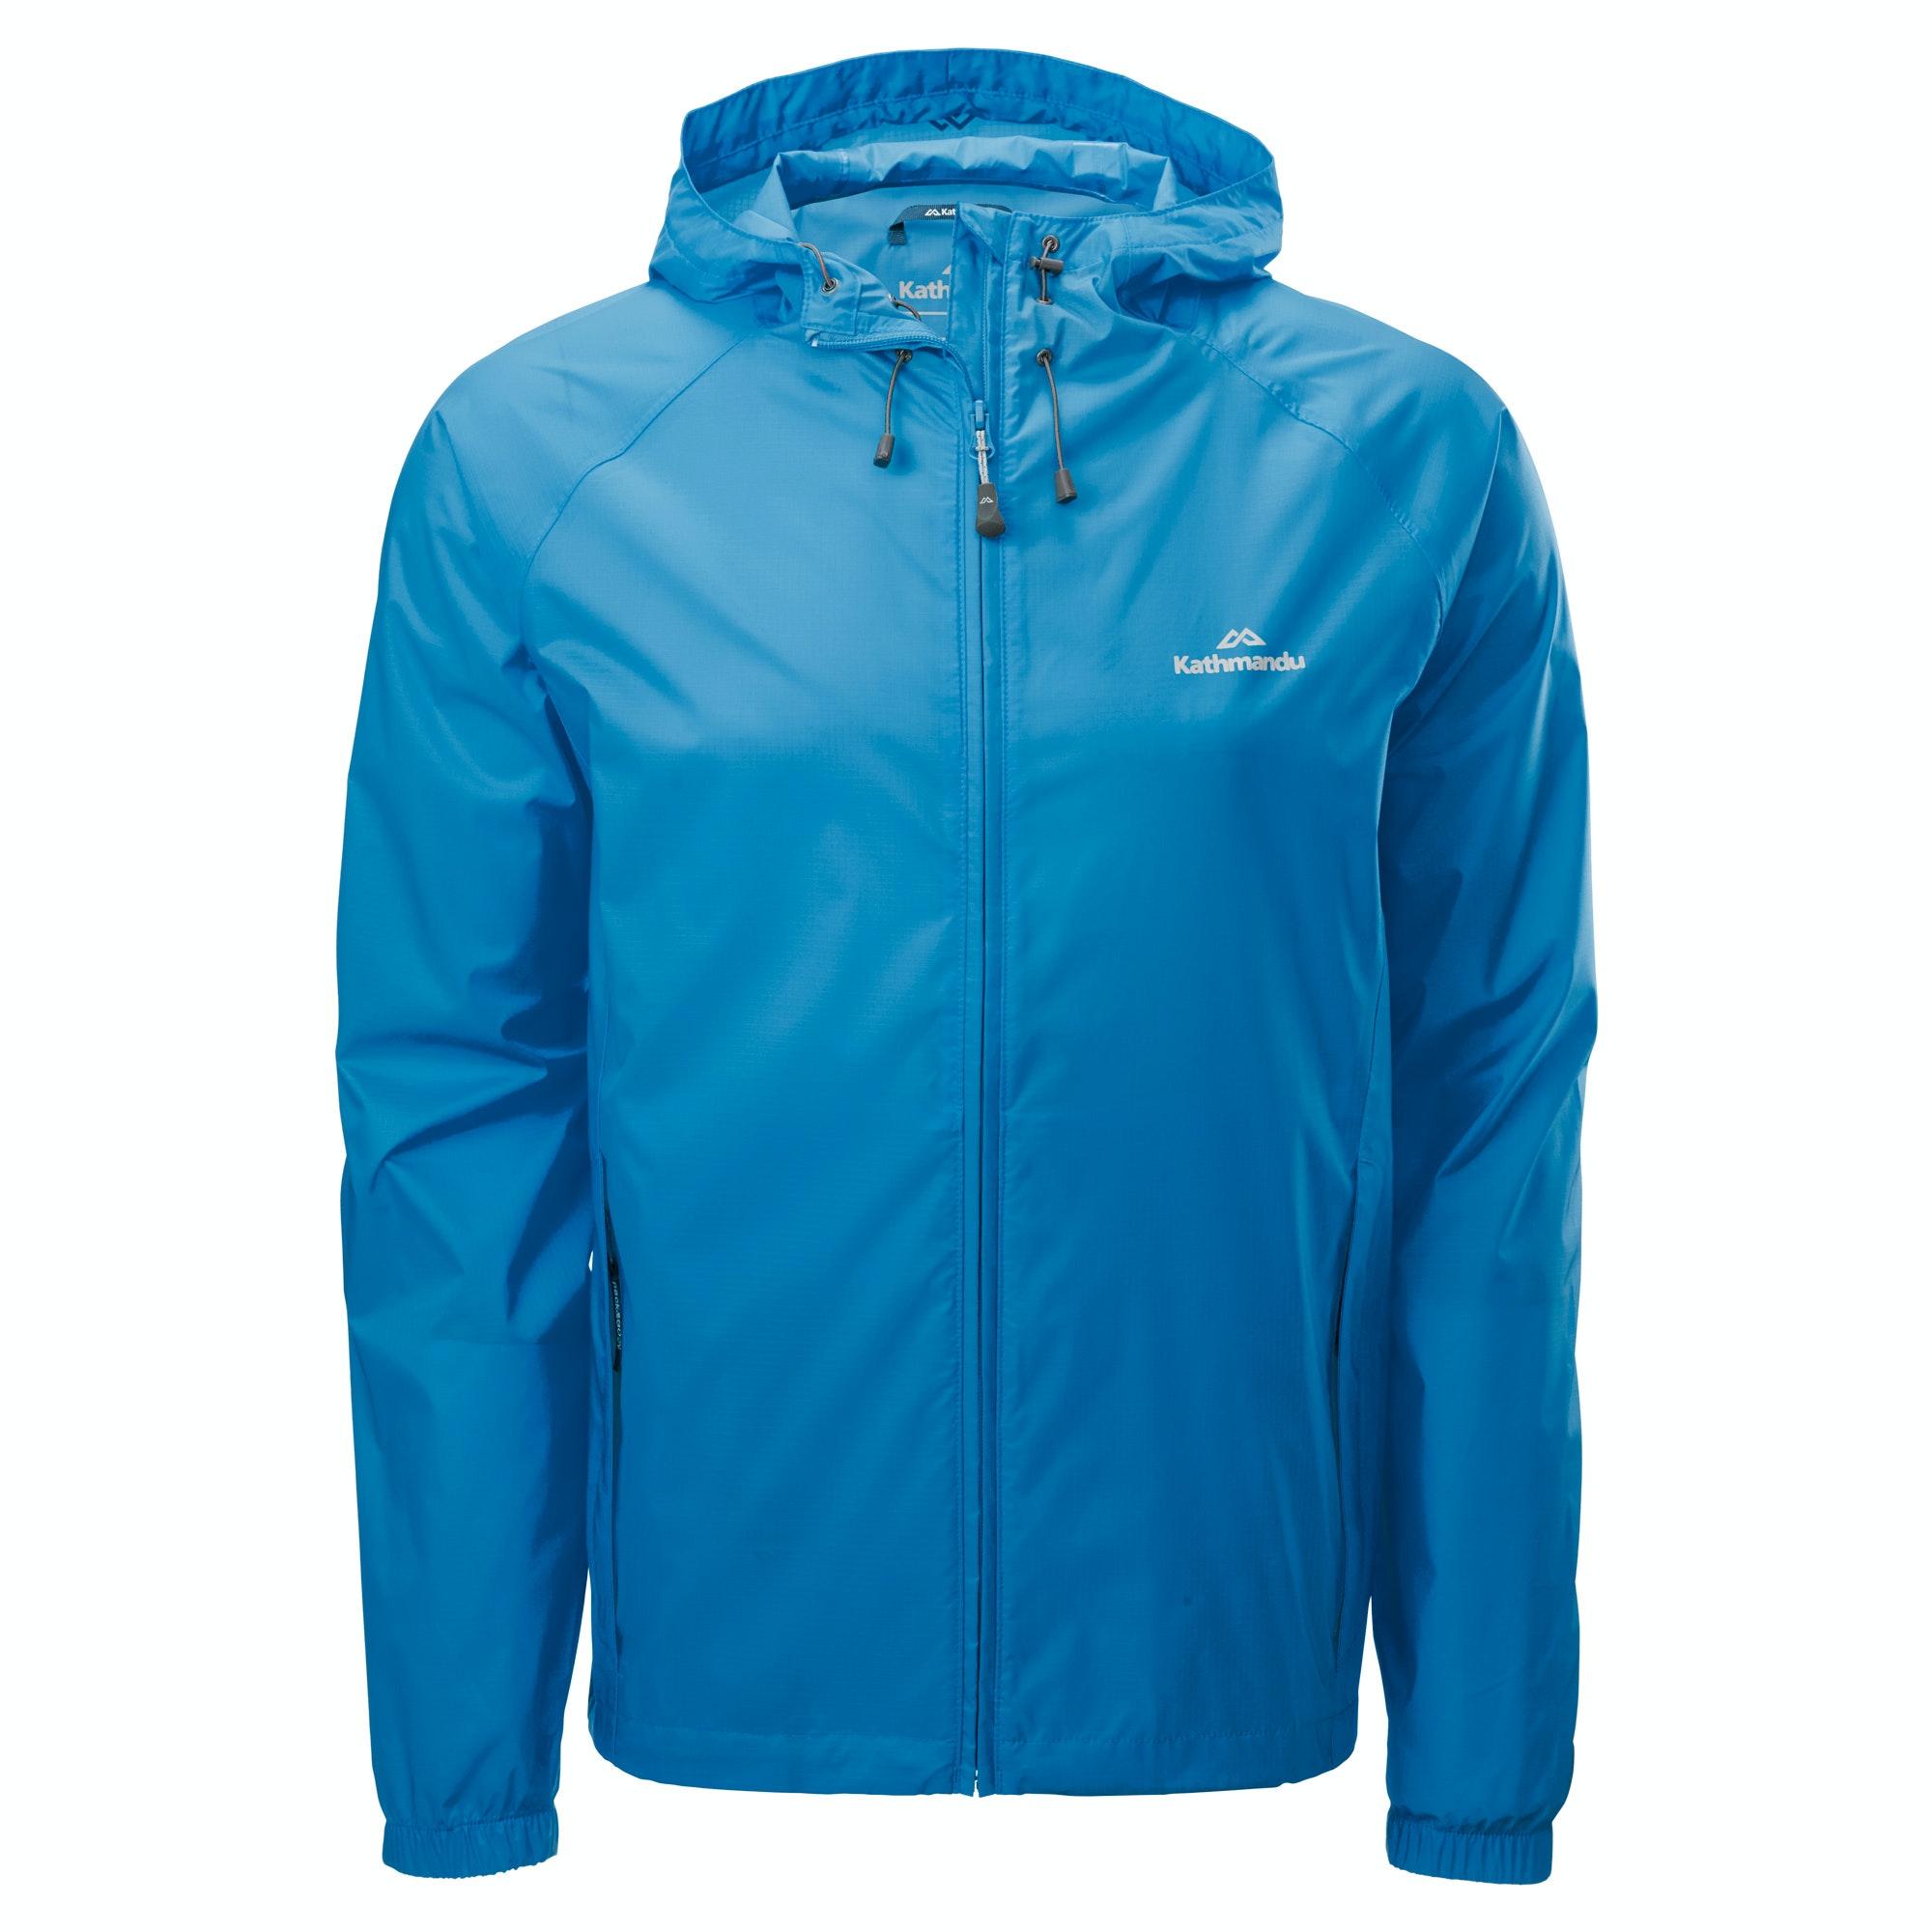 Pocket-it Men's Rain Jacket v3 - Storm Blue